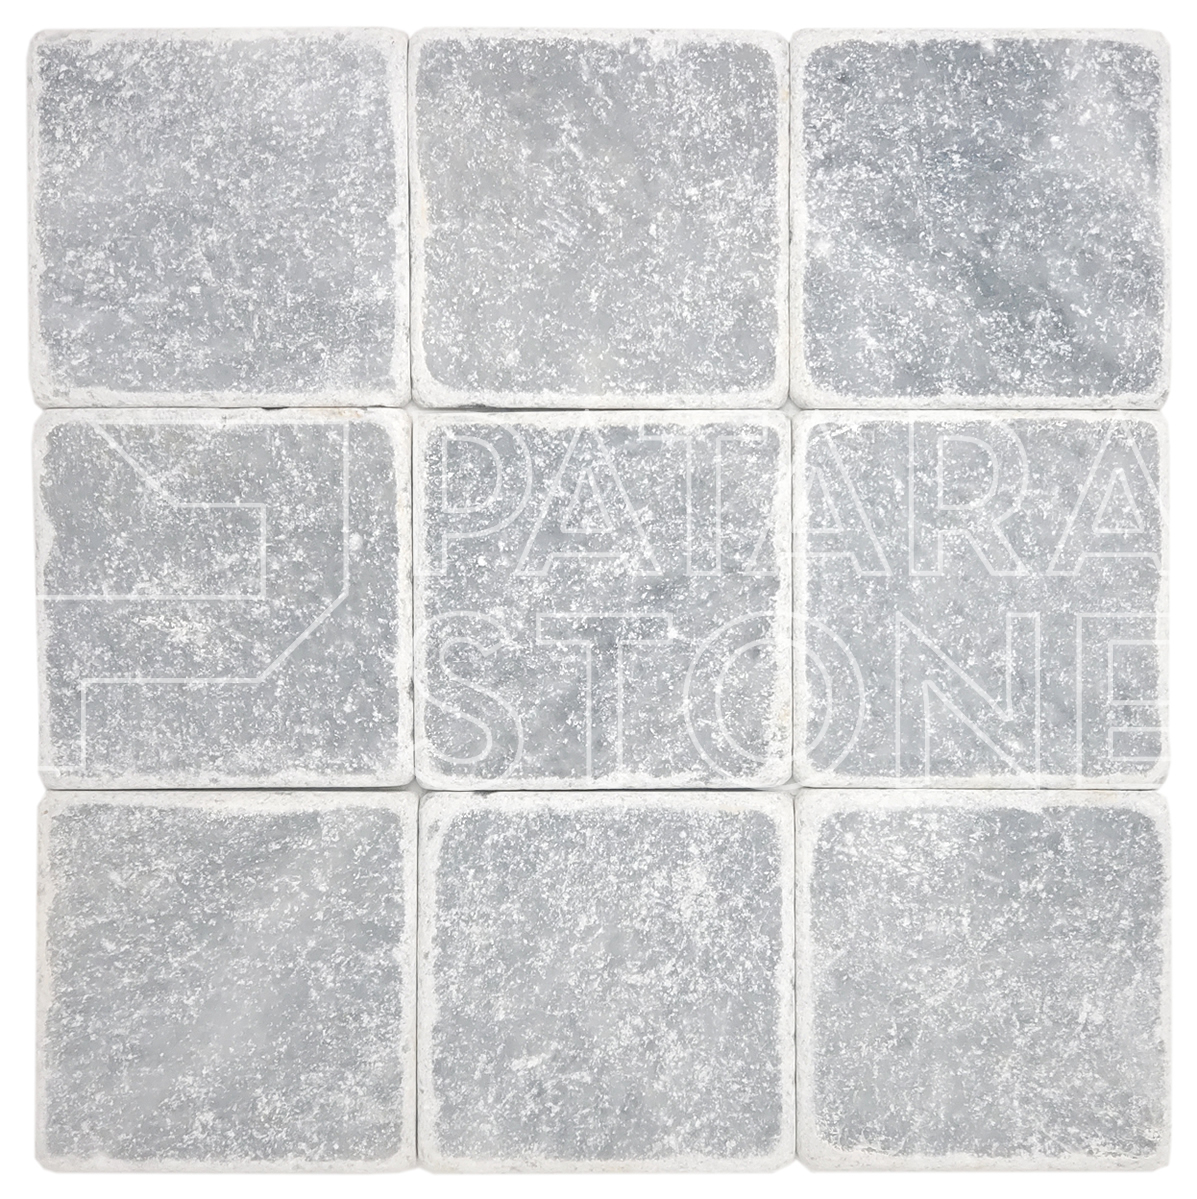 mesa gray tumbled 4x4 patara stone